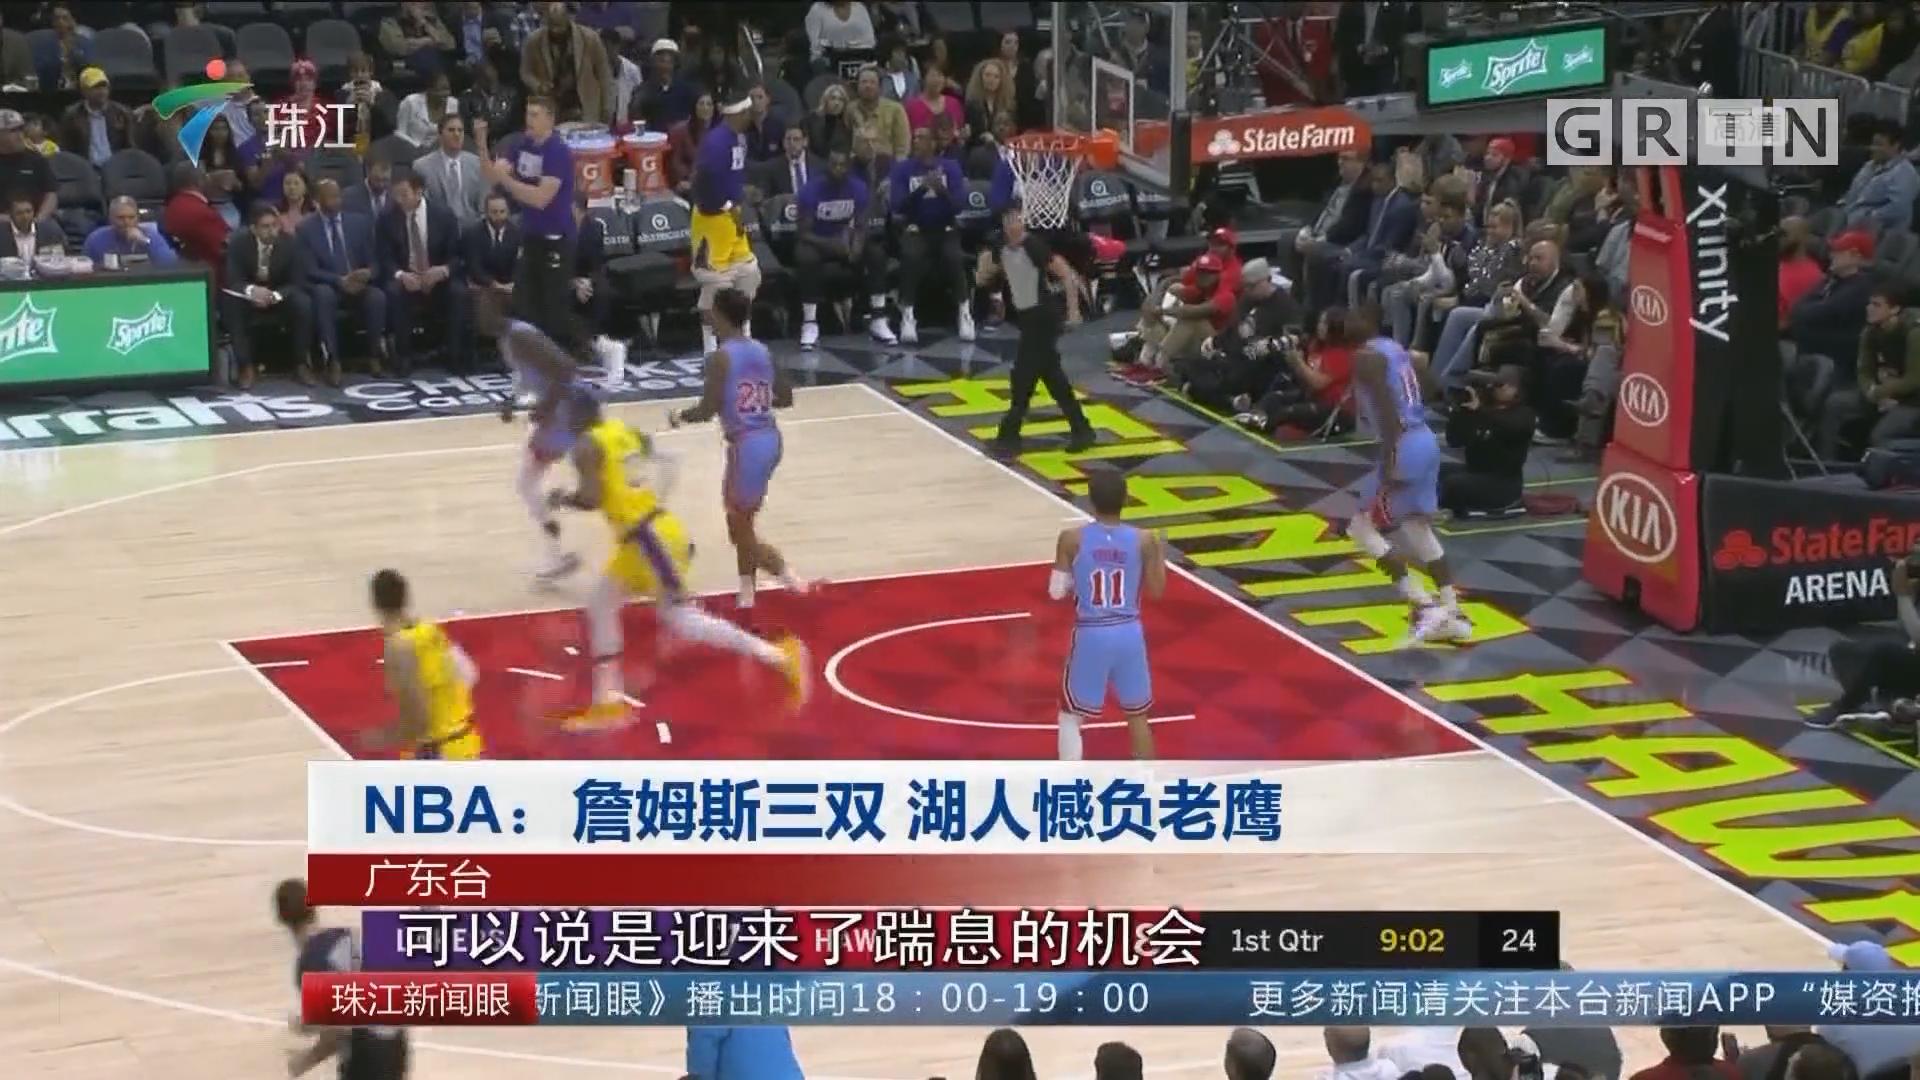 NBA:詹姆斯三双 湖人憾负老鹰